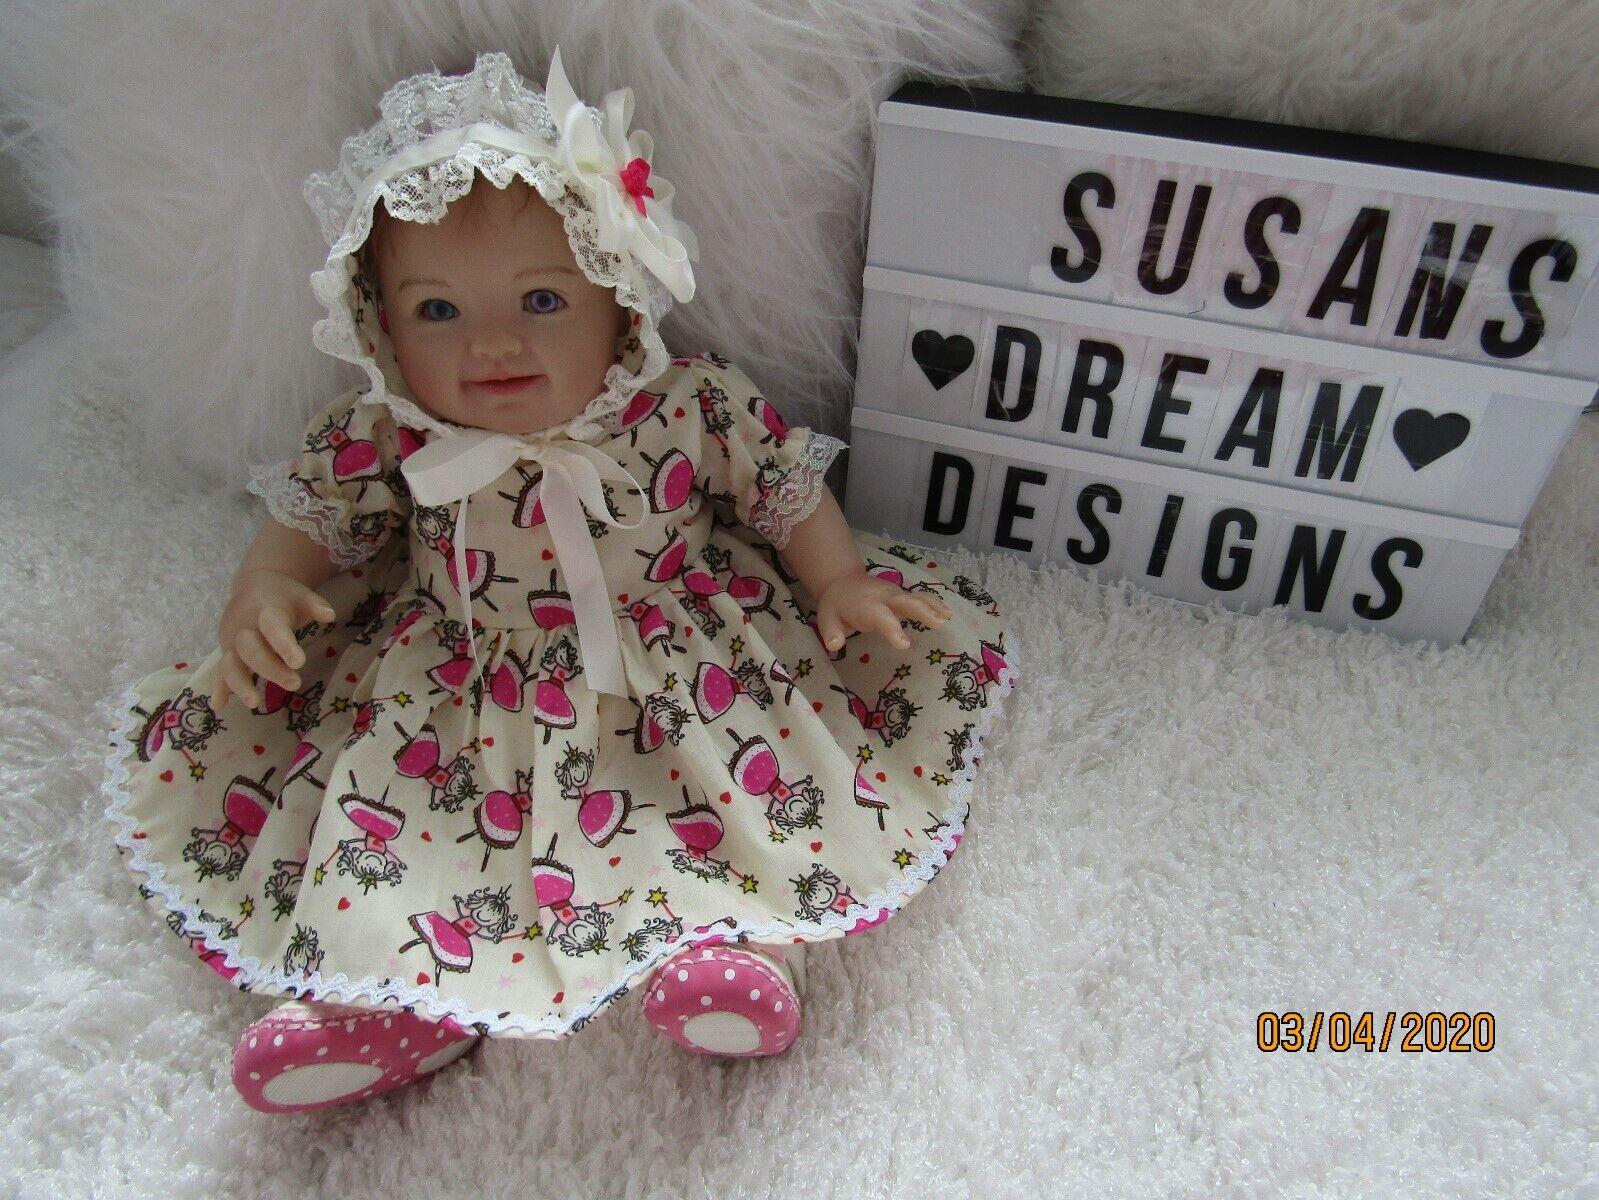 "CLOTHES 0-3MTHS BABY /17"" REBORN DOLL CREAM/CERISE FAIRY DRESS AND BONNET NEW"